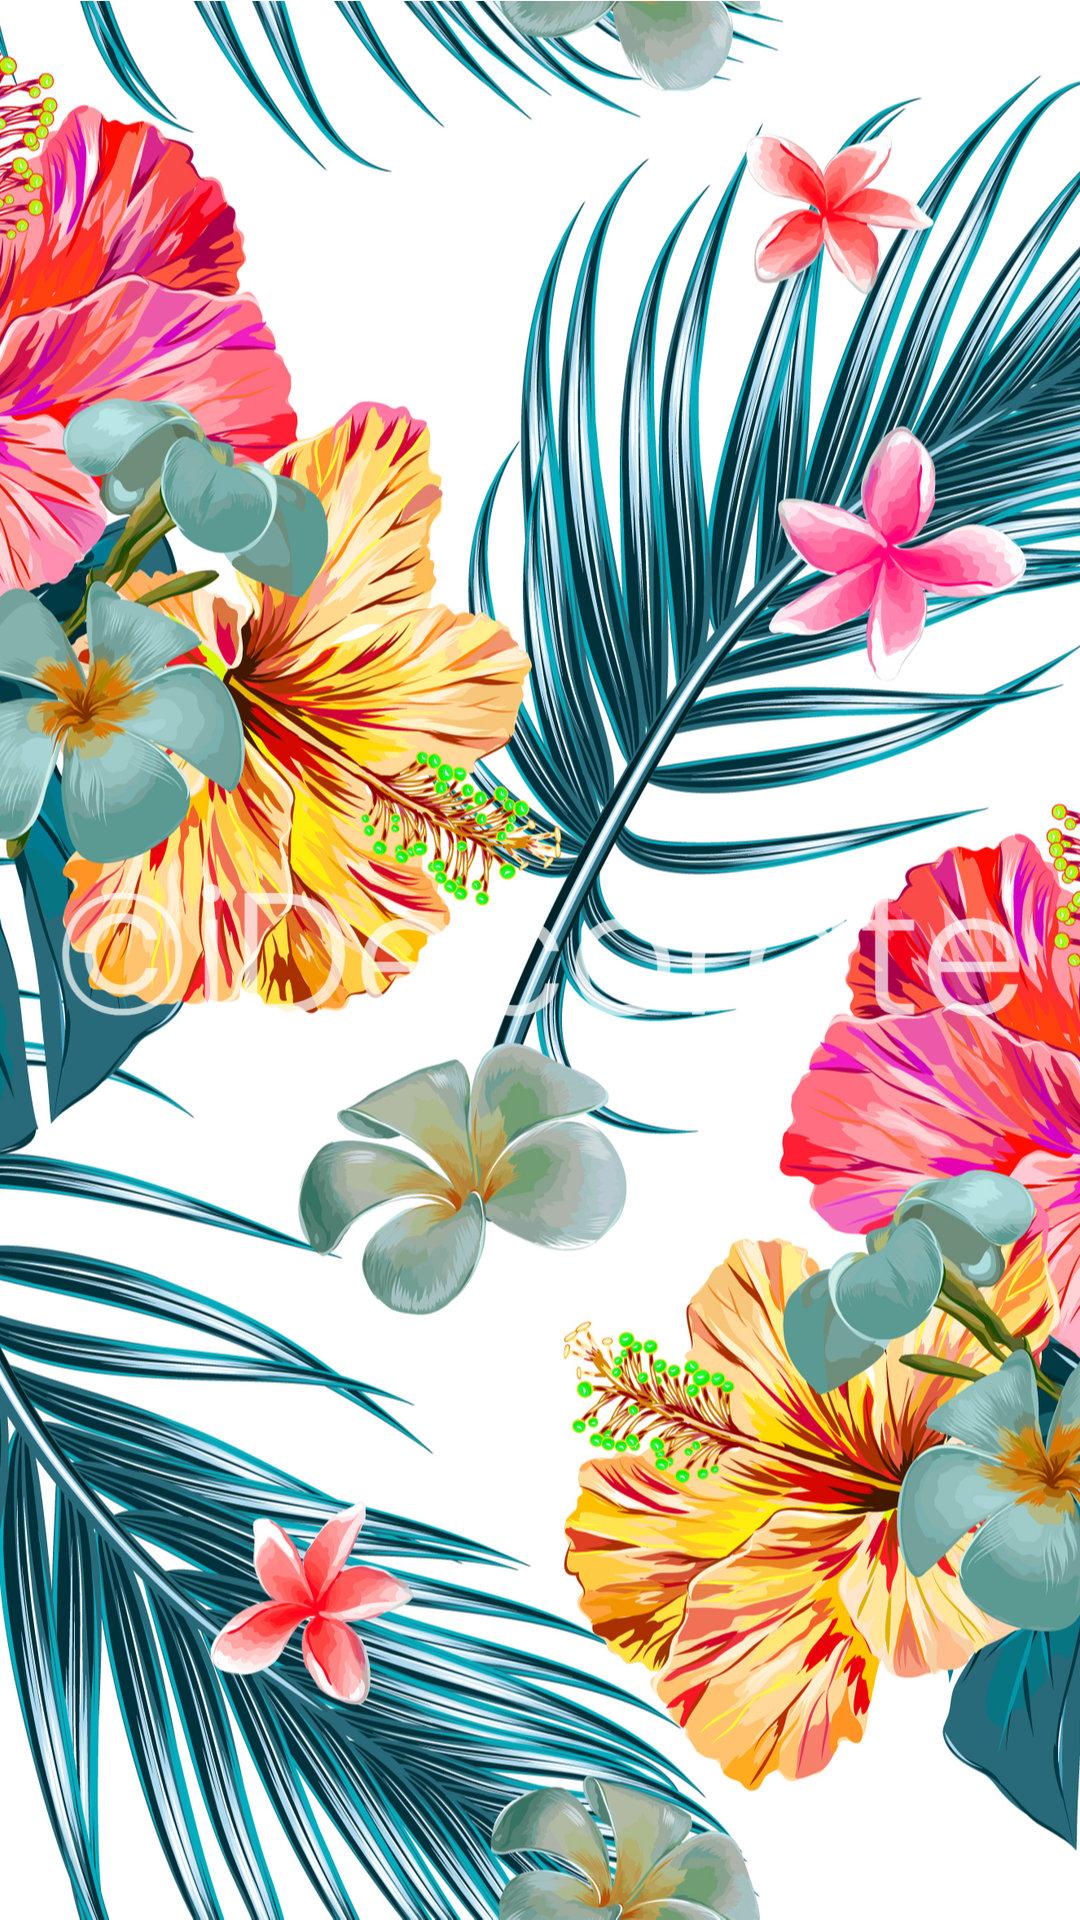 Tropical Hawaiian Wallpaper Idecorate Hawaiian background stock vectors, clipart and illustrations. tropical hawaiian wallpaper